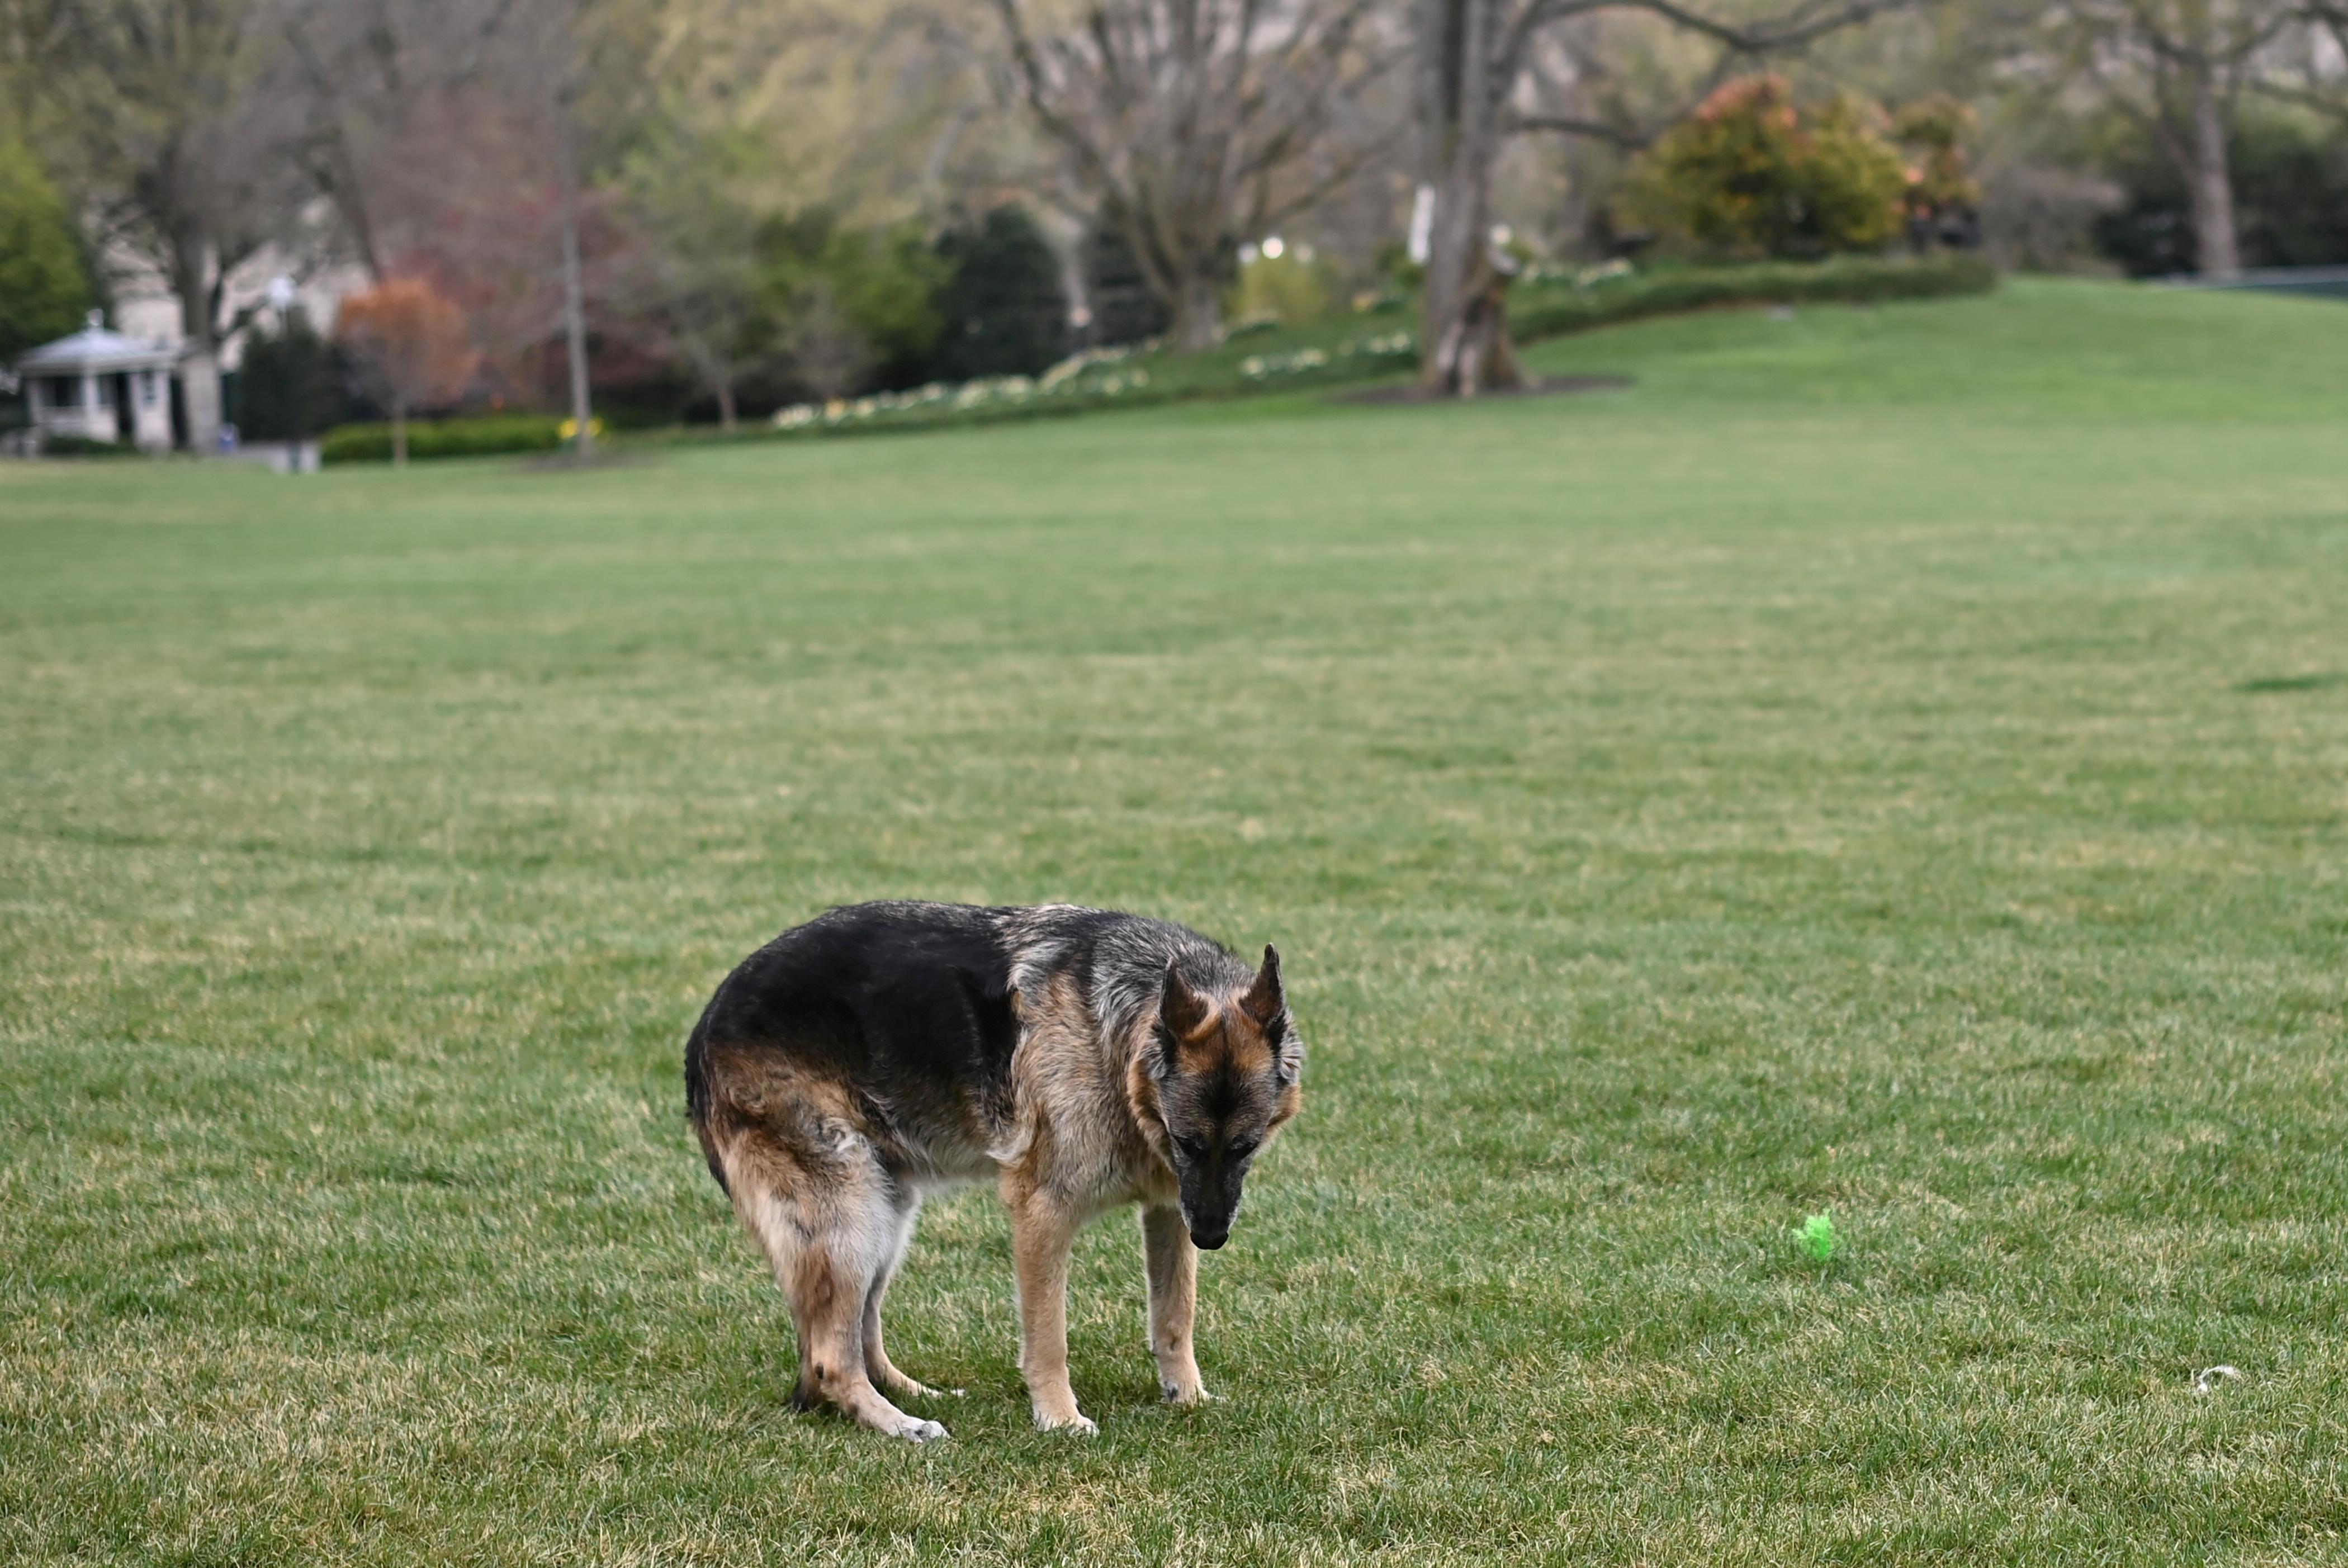 U.S. President Joe Biden's dog Champ is seen on the South Lawn of the White House in Washington, D.C., U.S., March 31, 2021. Mandel Ngan/Pool via REUTERS/File Photo